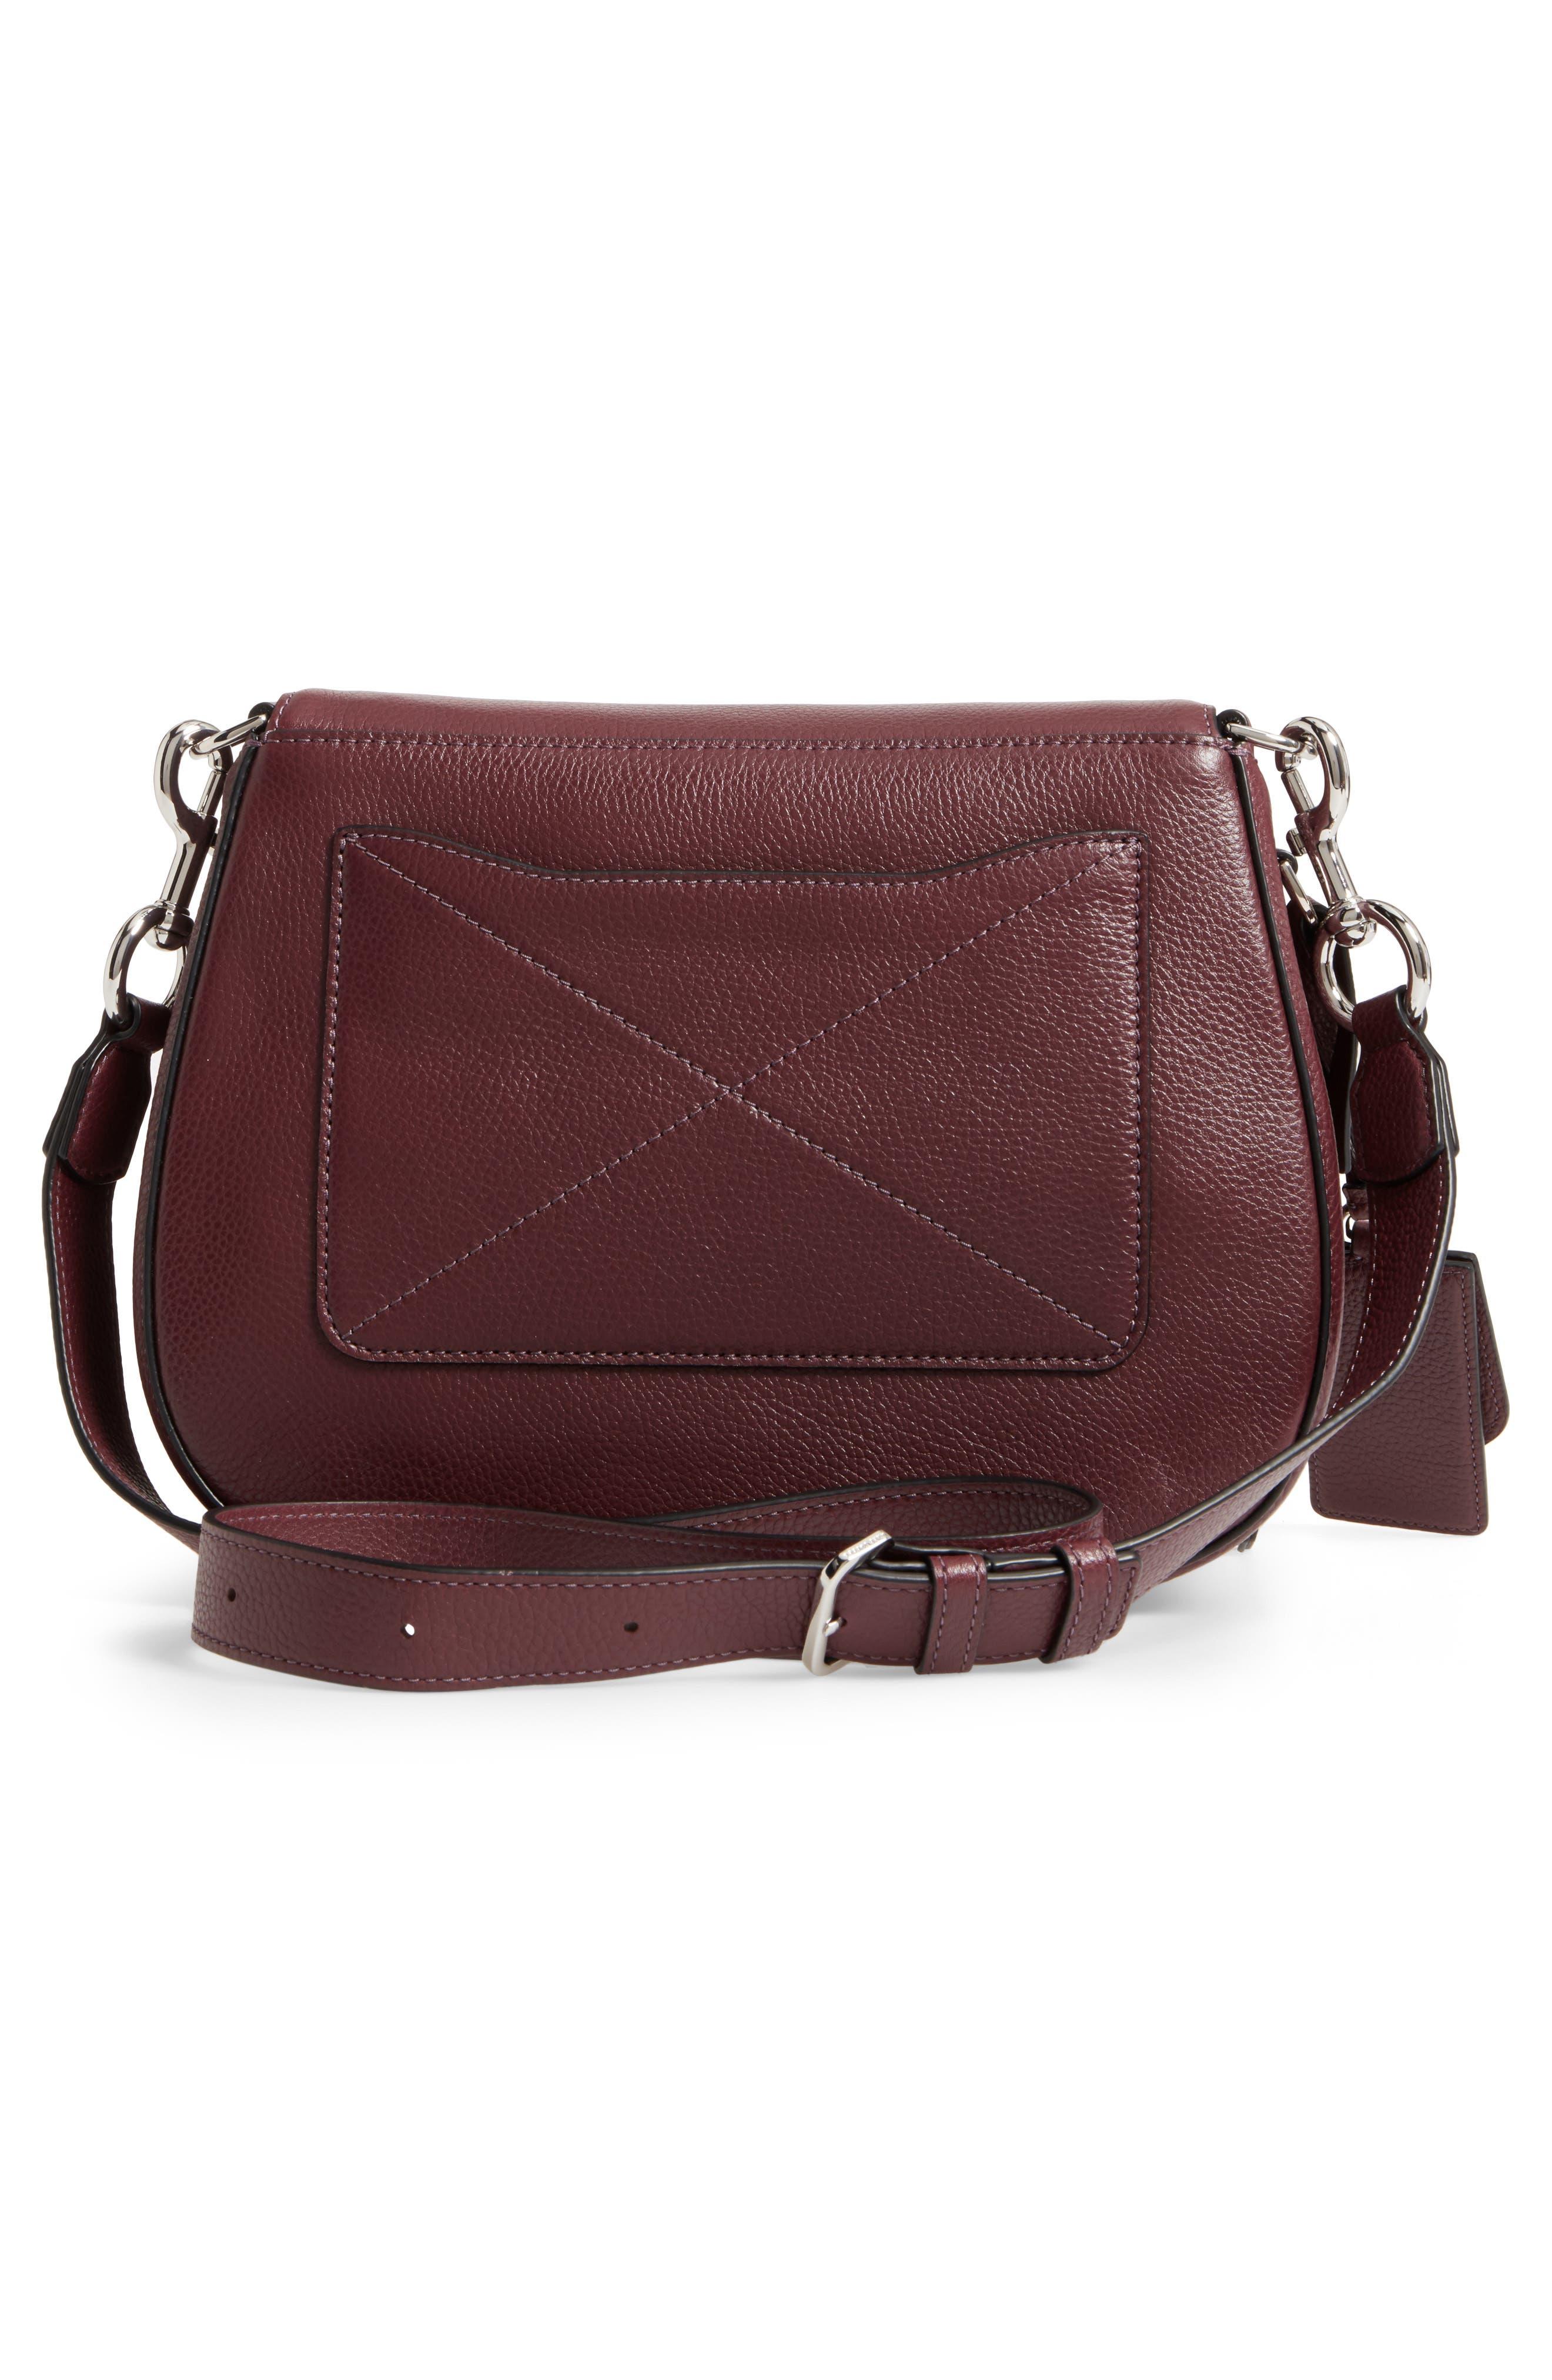 Recruit Nomad Pebbled Leather Crossbody Bag,                             Alternate thumbnail 3, color,                             538